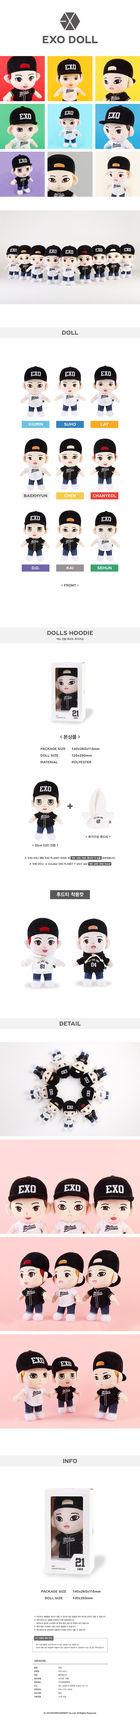 EXO Official Goods - Doll (Baek Hyun)